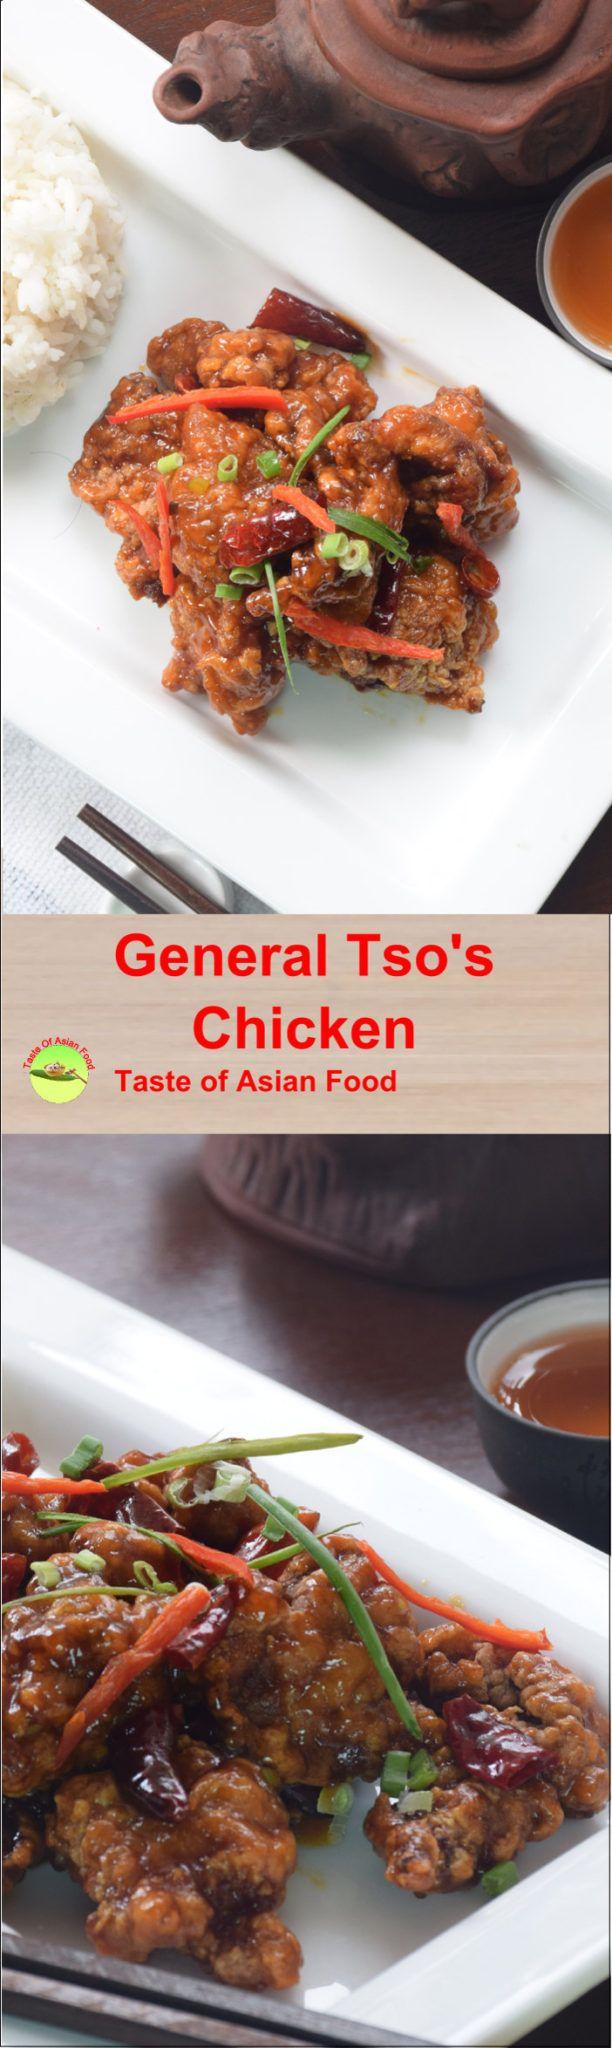 General's Tso chicken pin